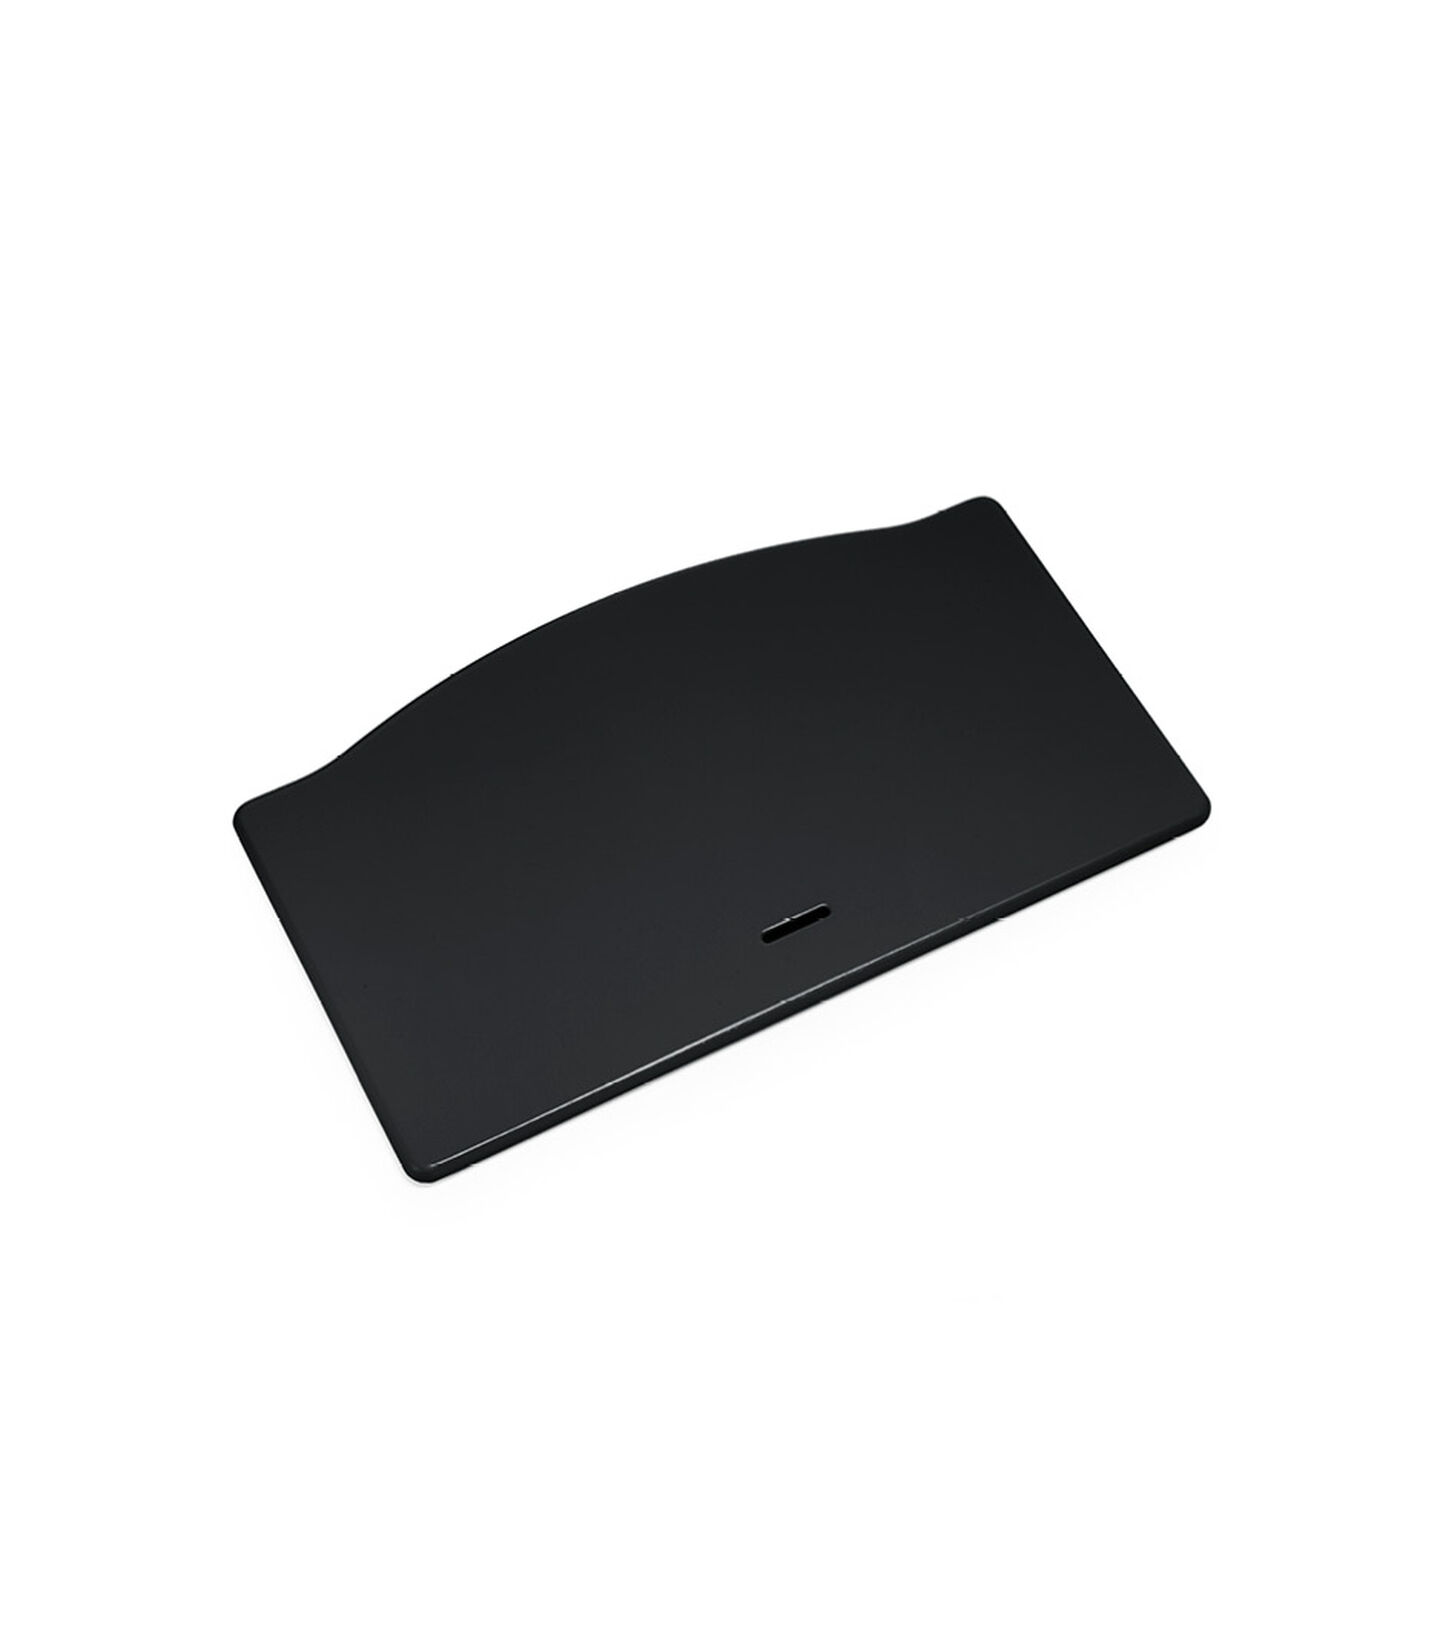 Tripp Trapp® Siddeplade Black, Black, mainview view 1